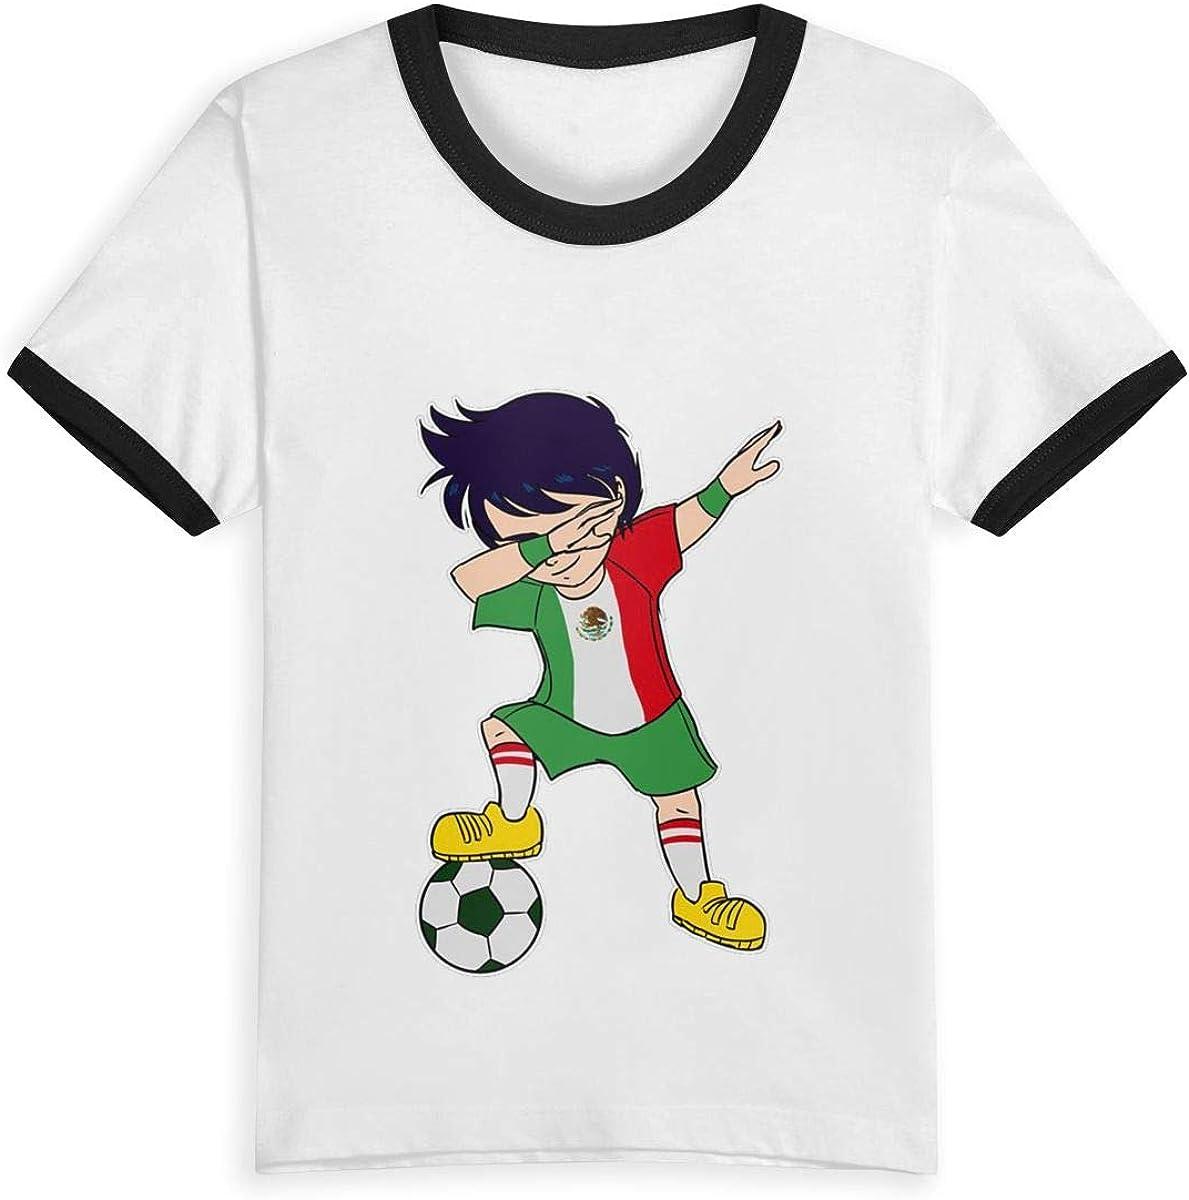 AMMAaaa Dab Football Kids T-Shirt Childrens Short Sleeve Shirts Printed Boys Girls